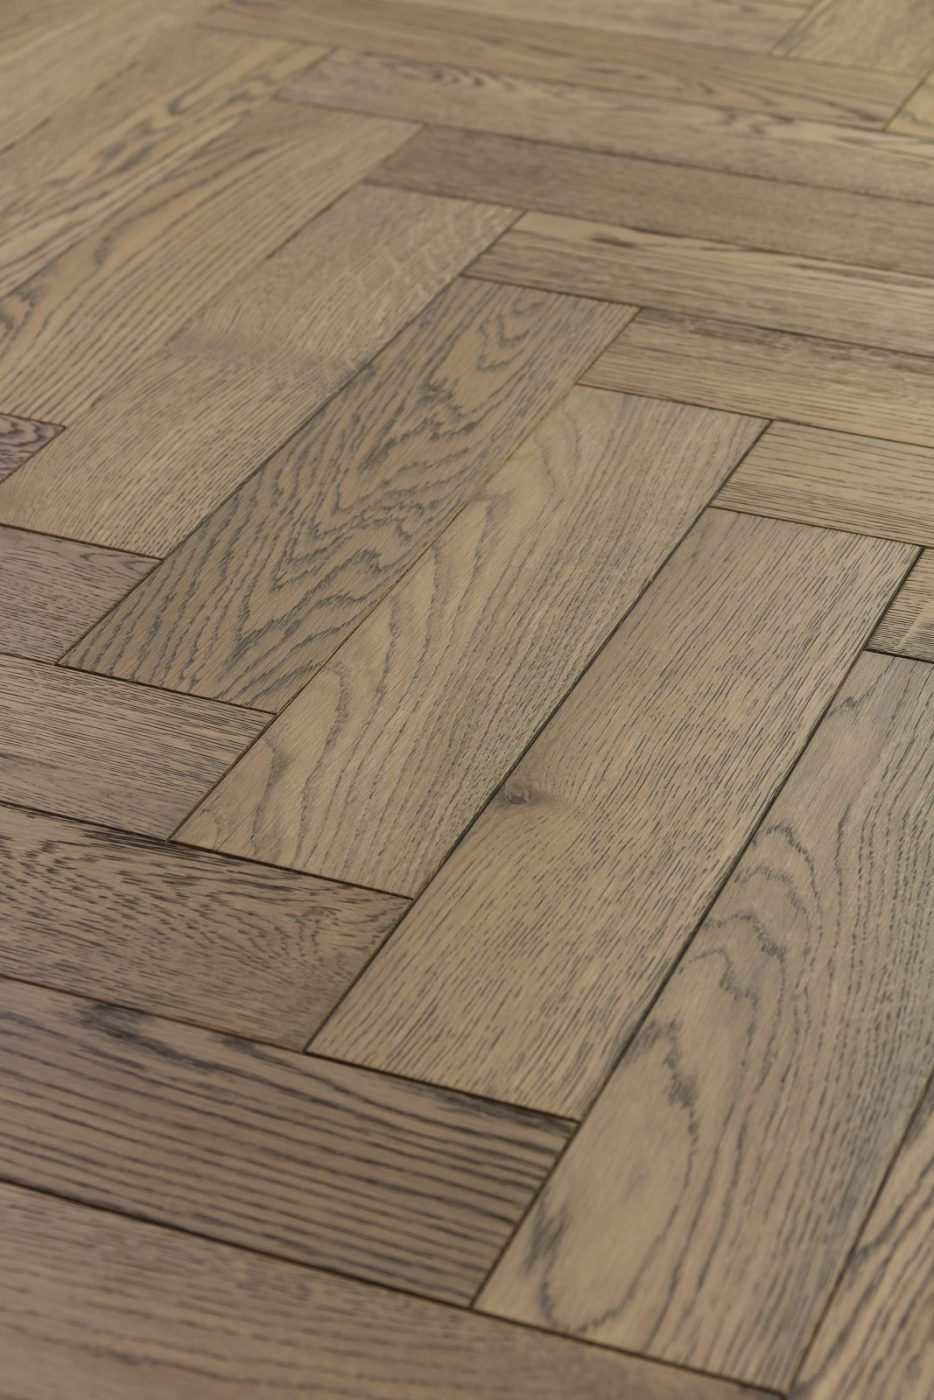 V4 Wood Flooring Engineered Planks Amp Parquet Best At